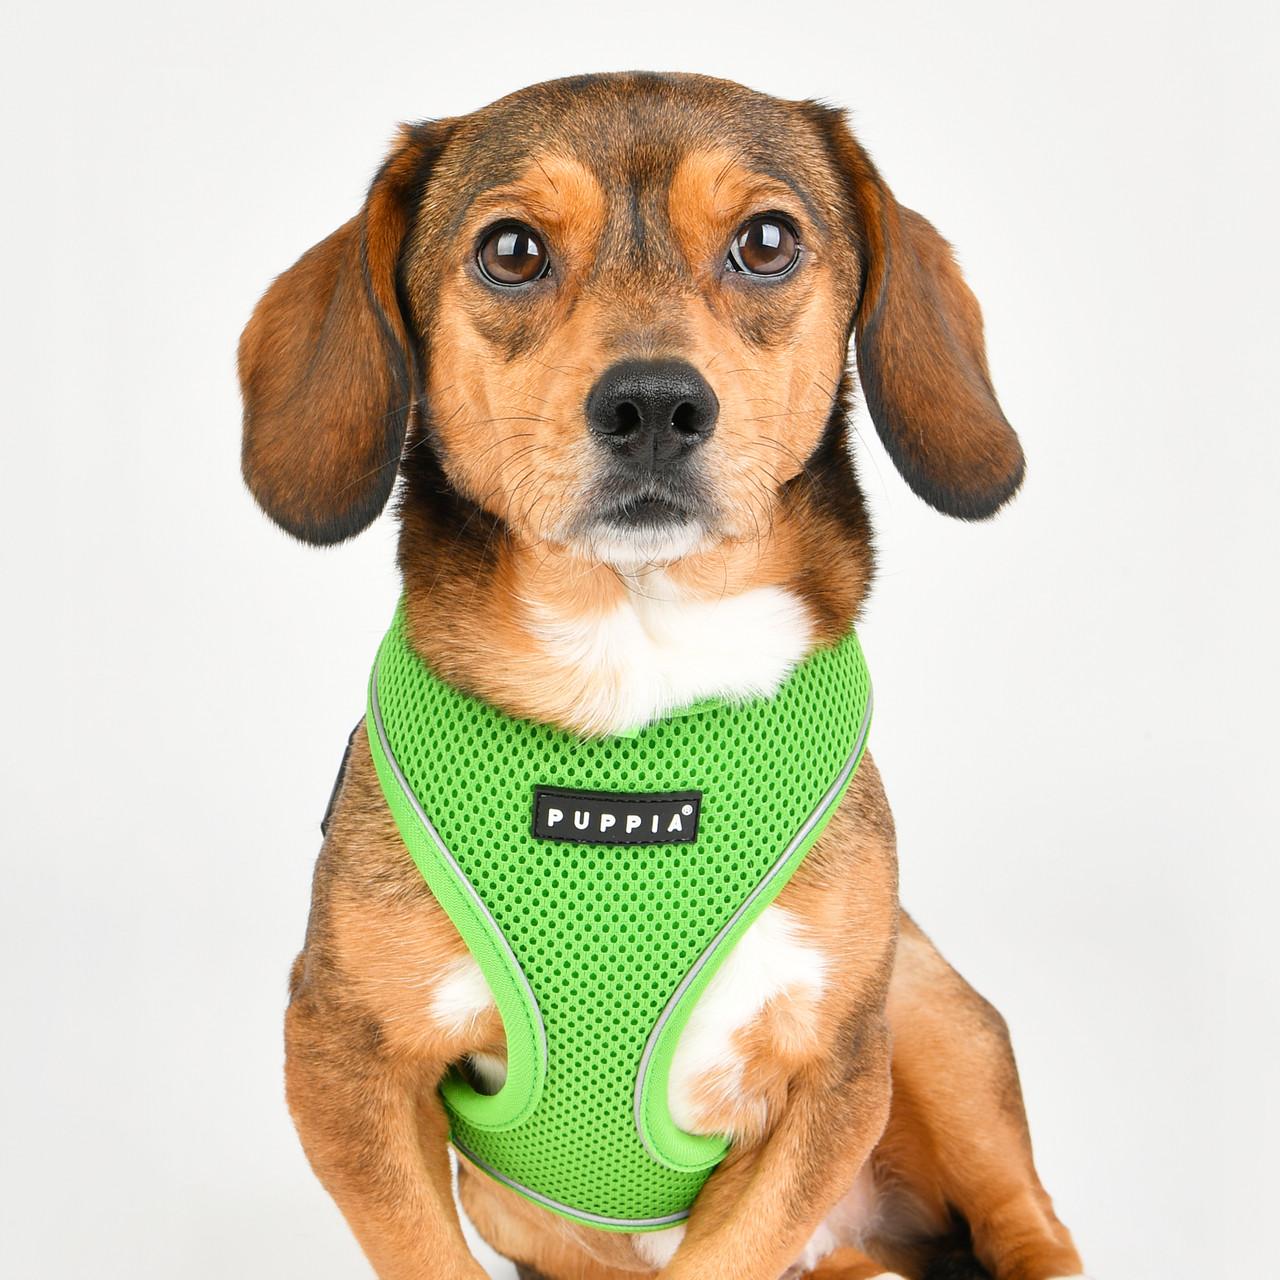 Puppia Reflective Soft Harness Pro A -NEW COLORS